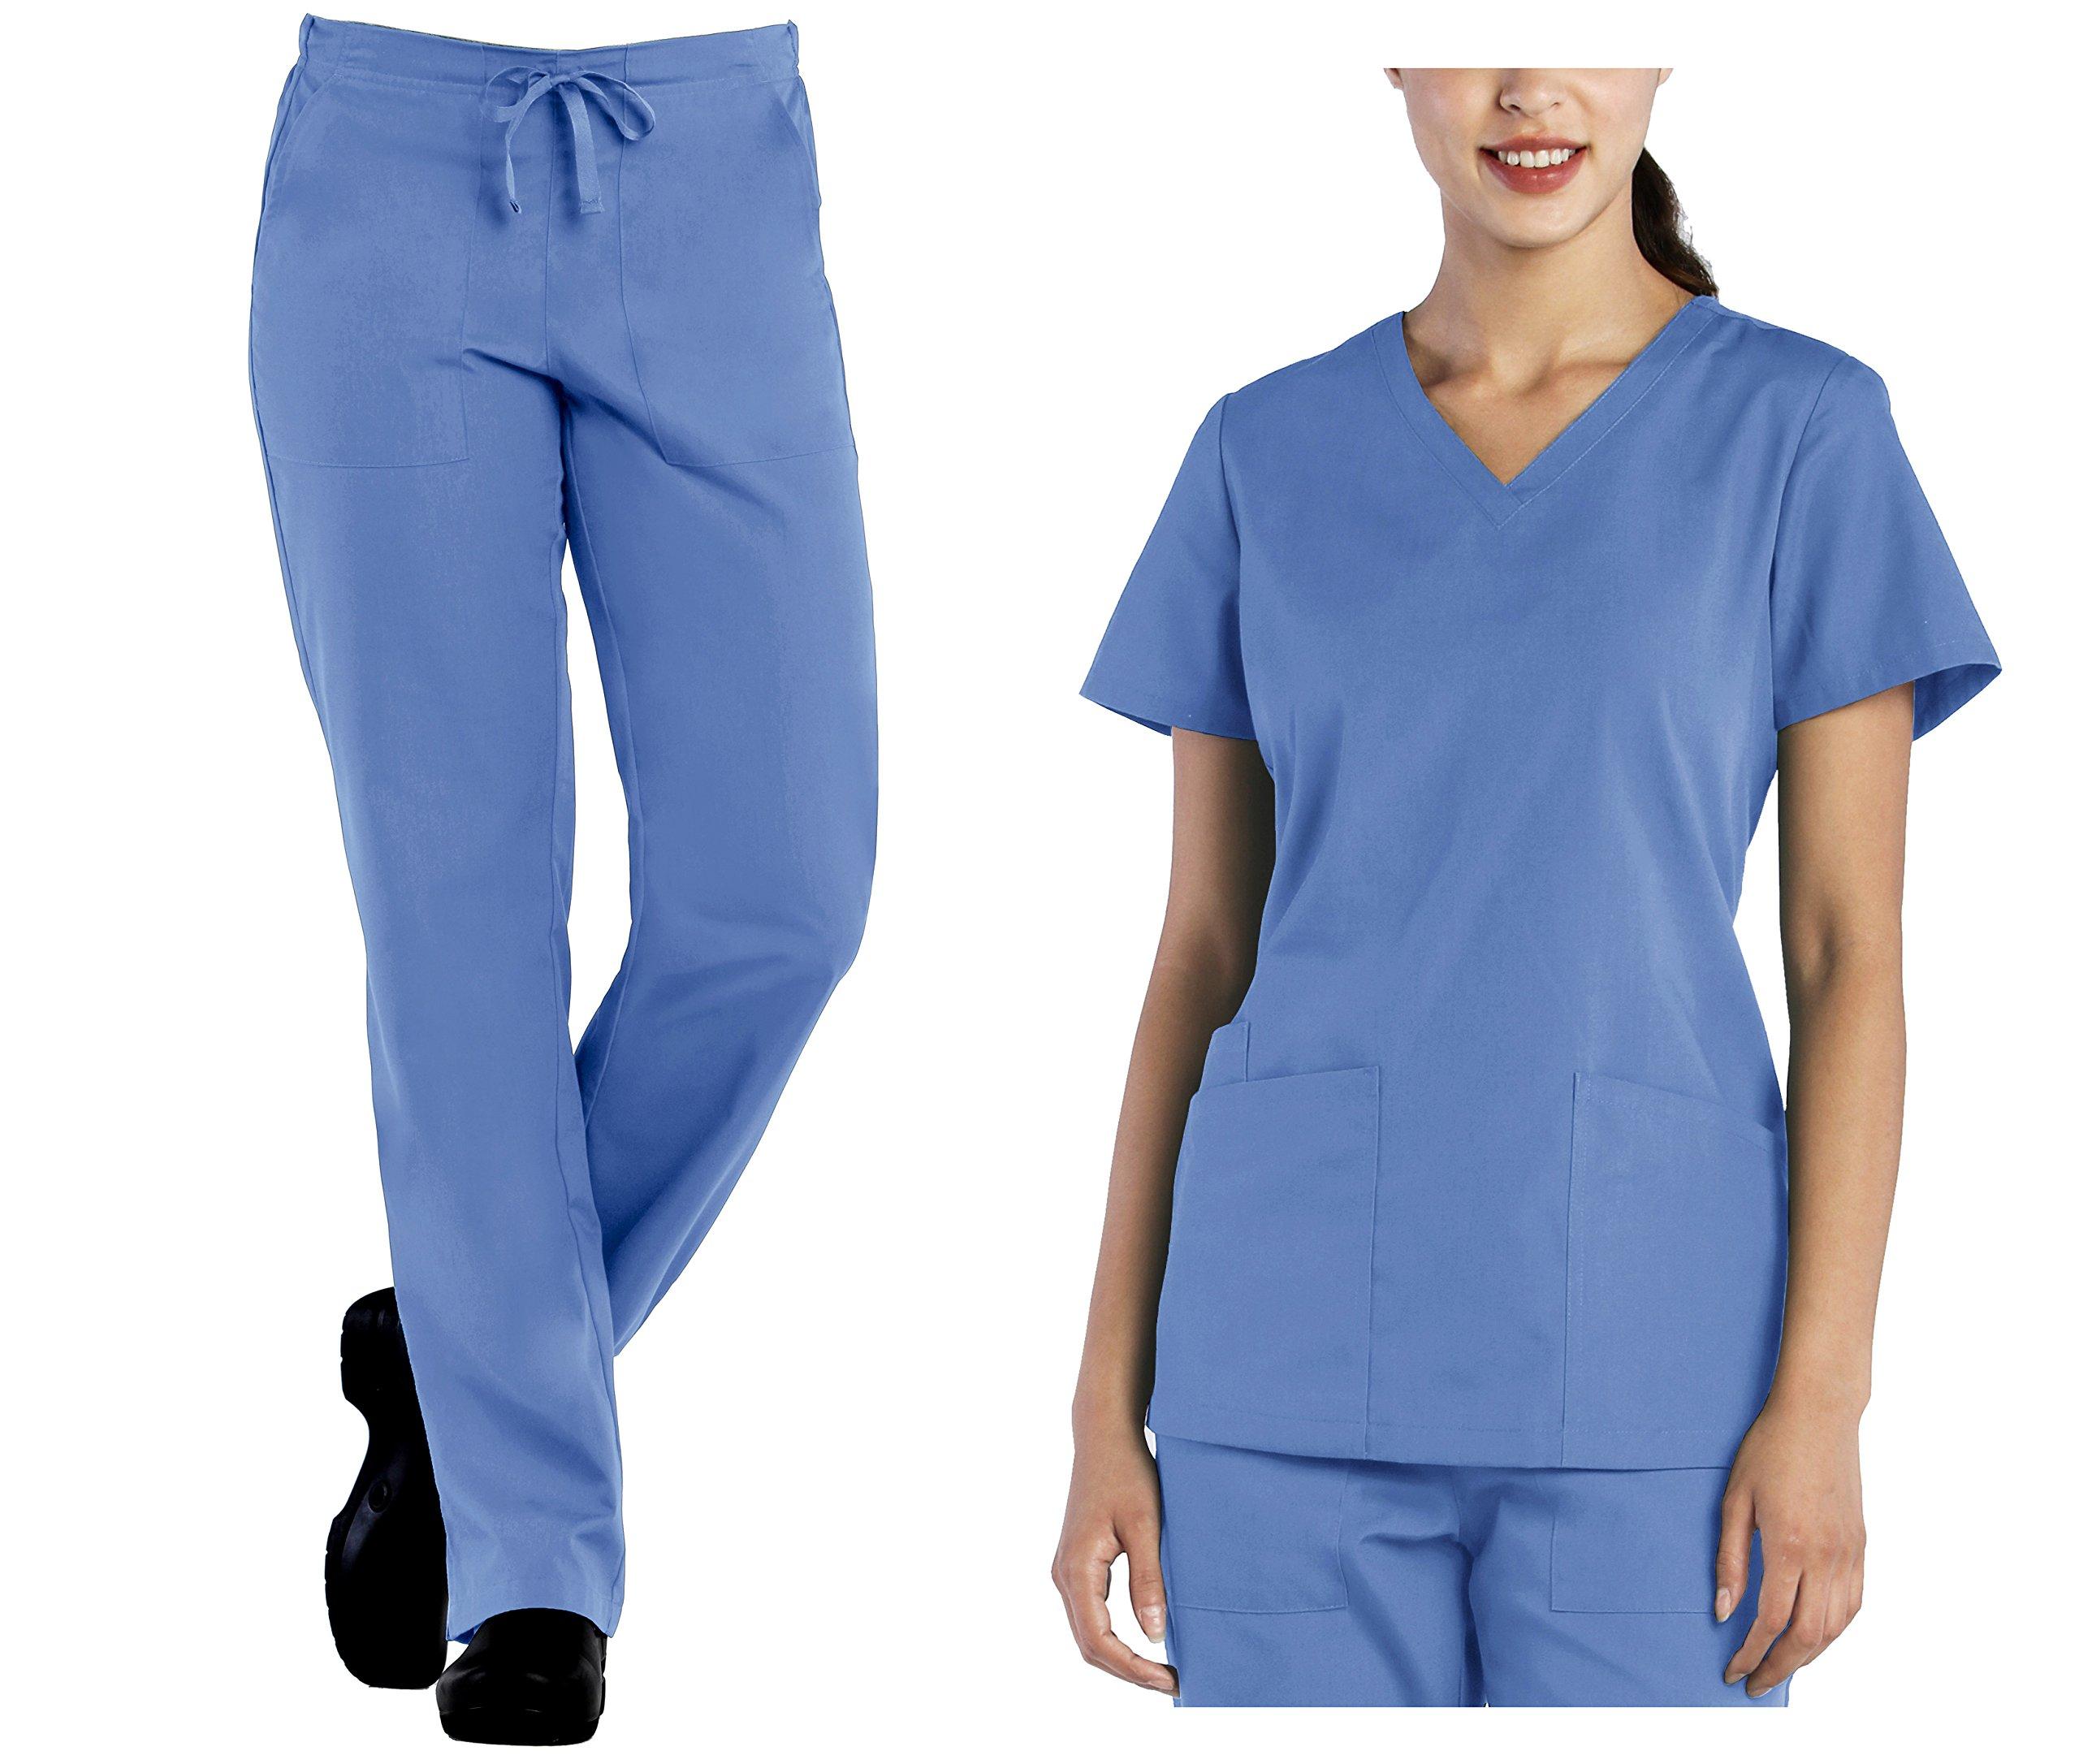 Tru Scrubs Ladies V-Neck Top & Drawstring Half Elastic Pant Scrub Set (Medium, Ceil Blue)